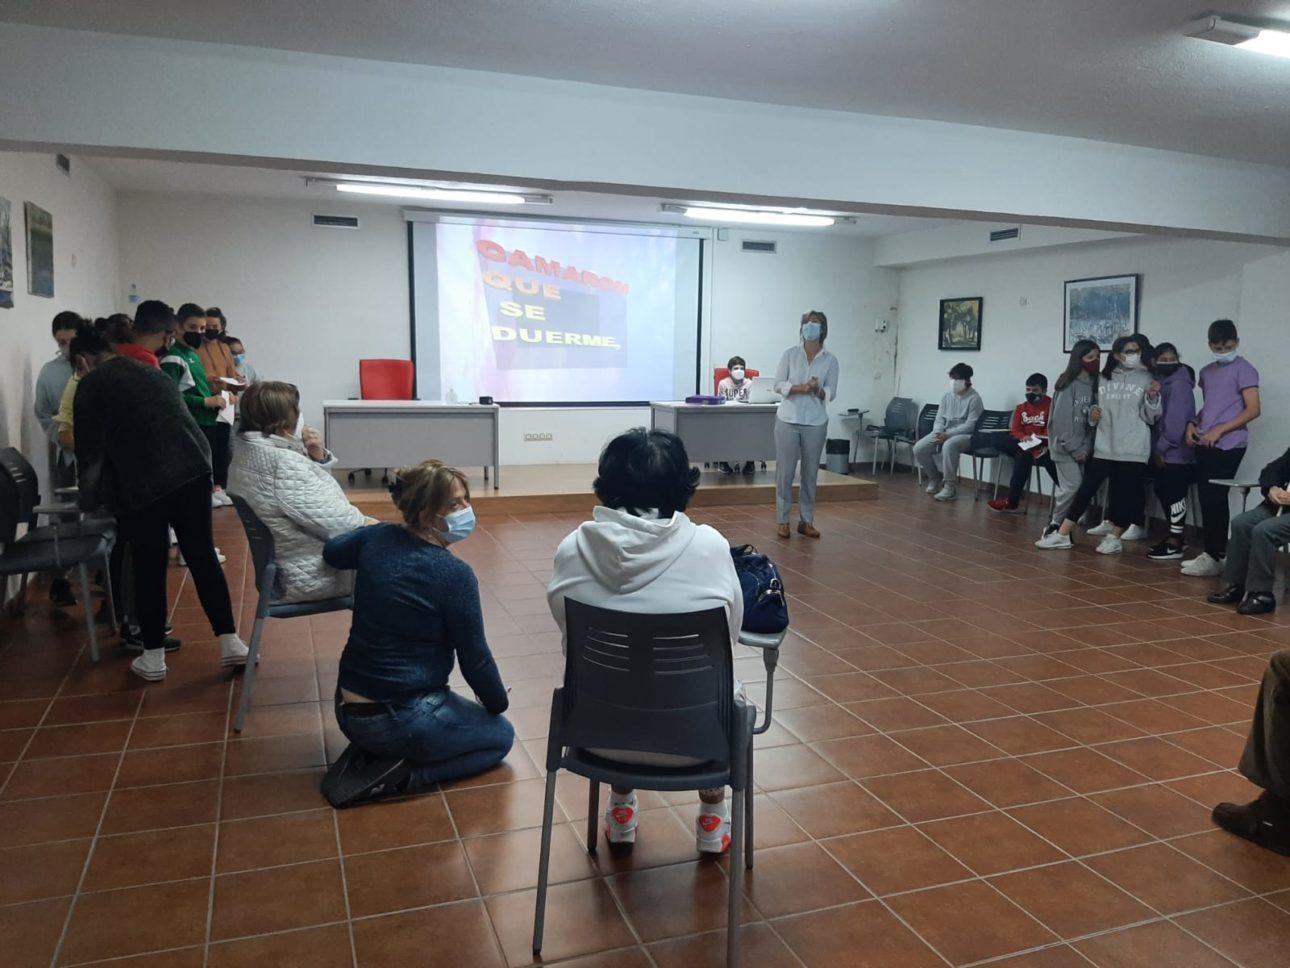 Jornada Genracional en Baiona 1 scaled Baiona